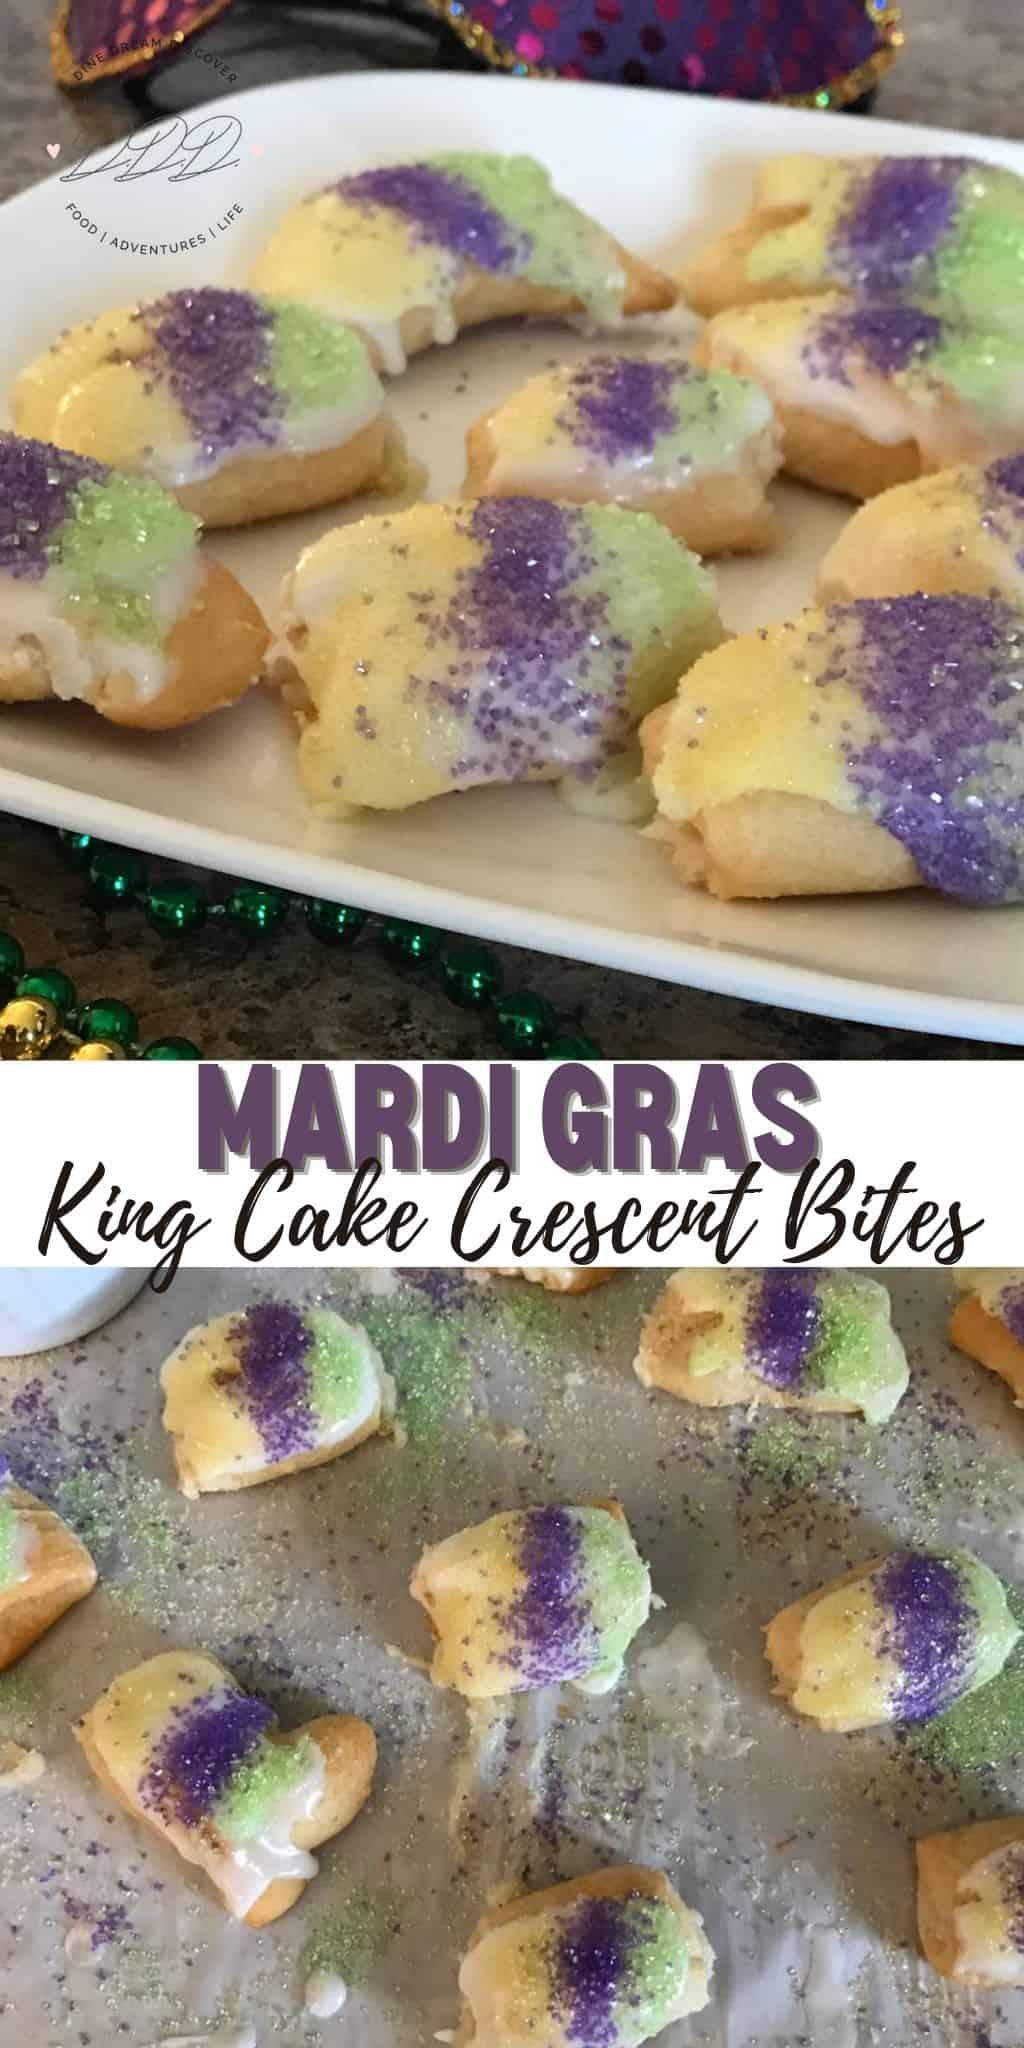 Mardi Gras King Cake Crescent Bites